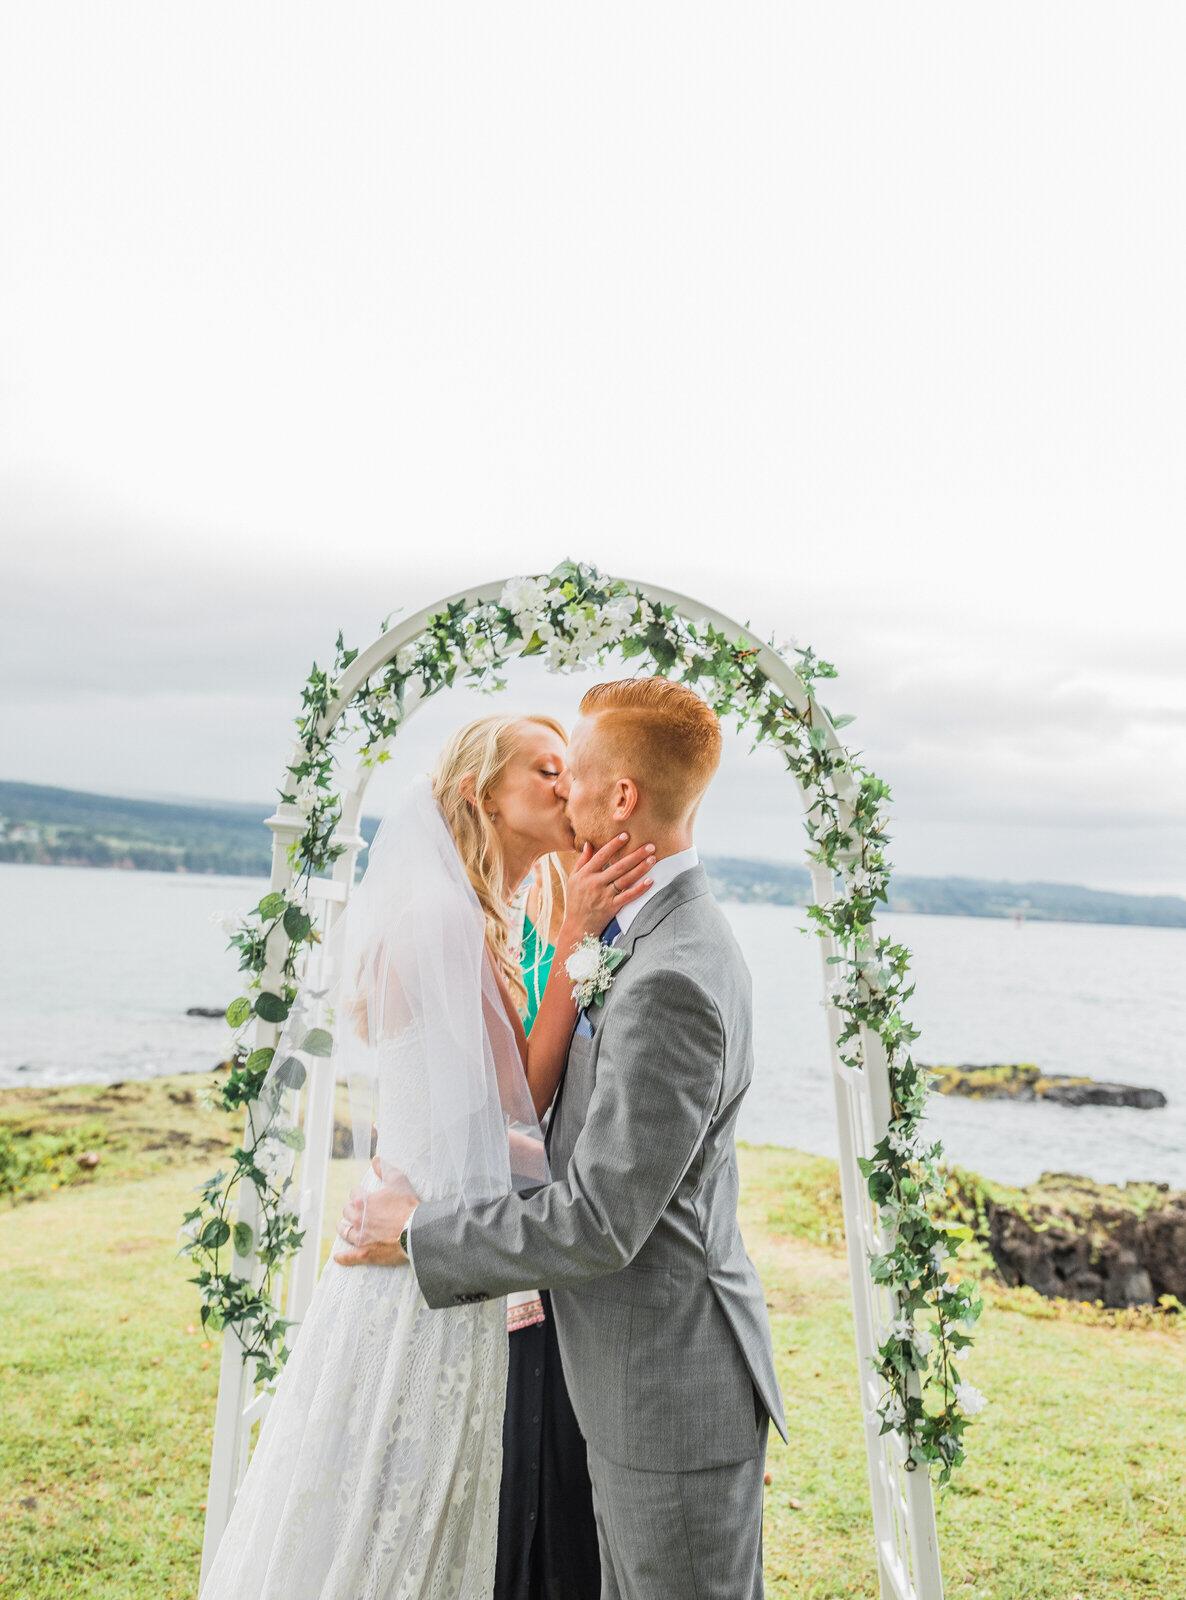 small-wedding-hawaii-destination-hilton-coconut-island-9793-1.jpg